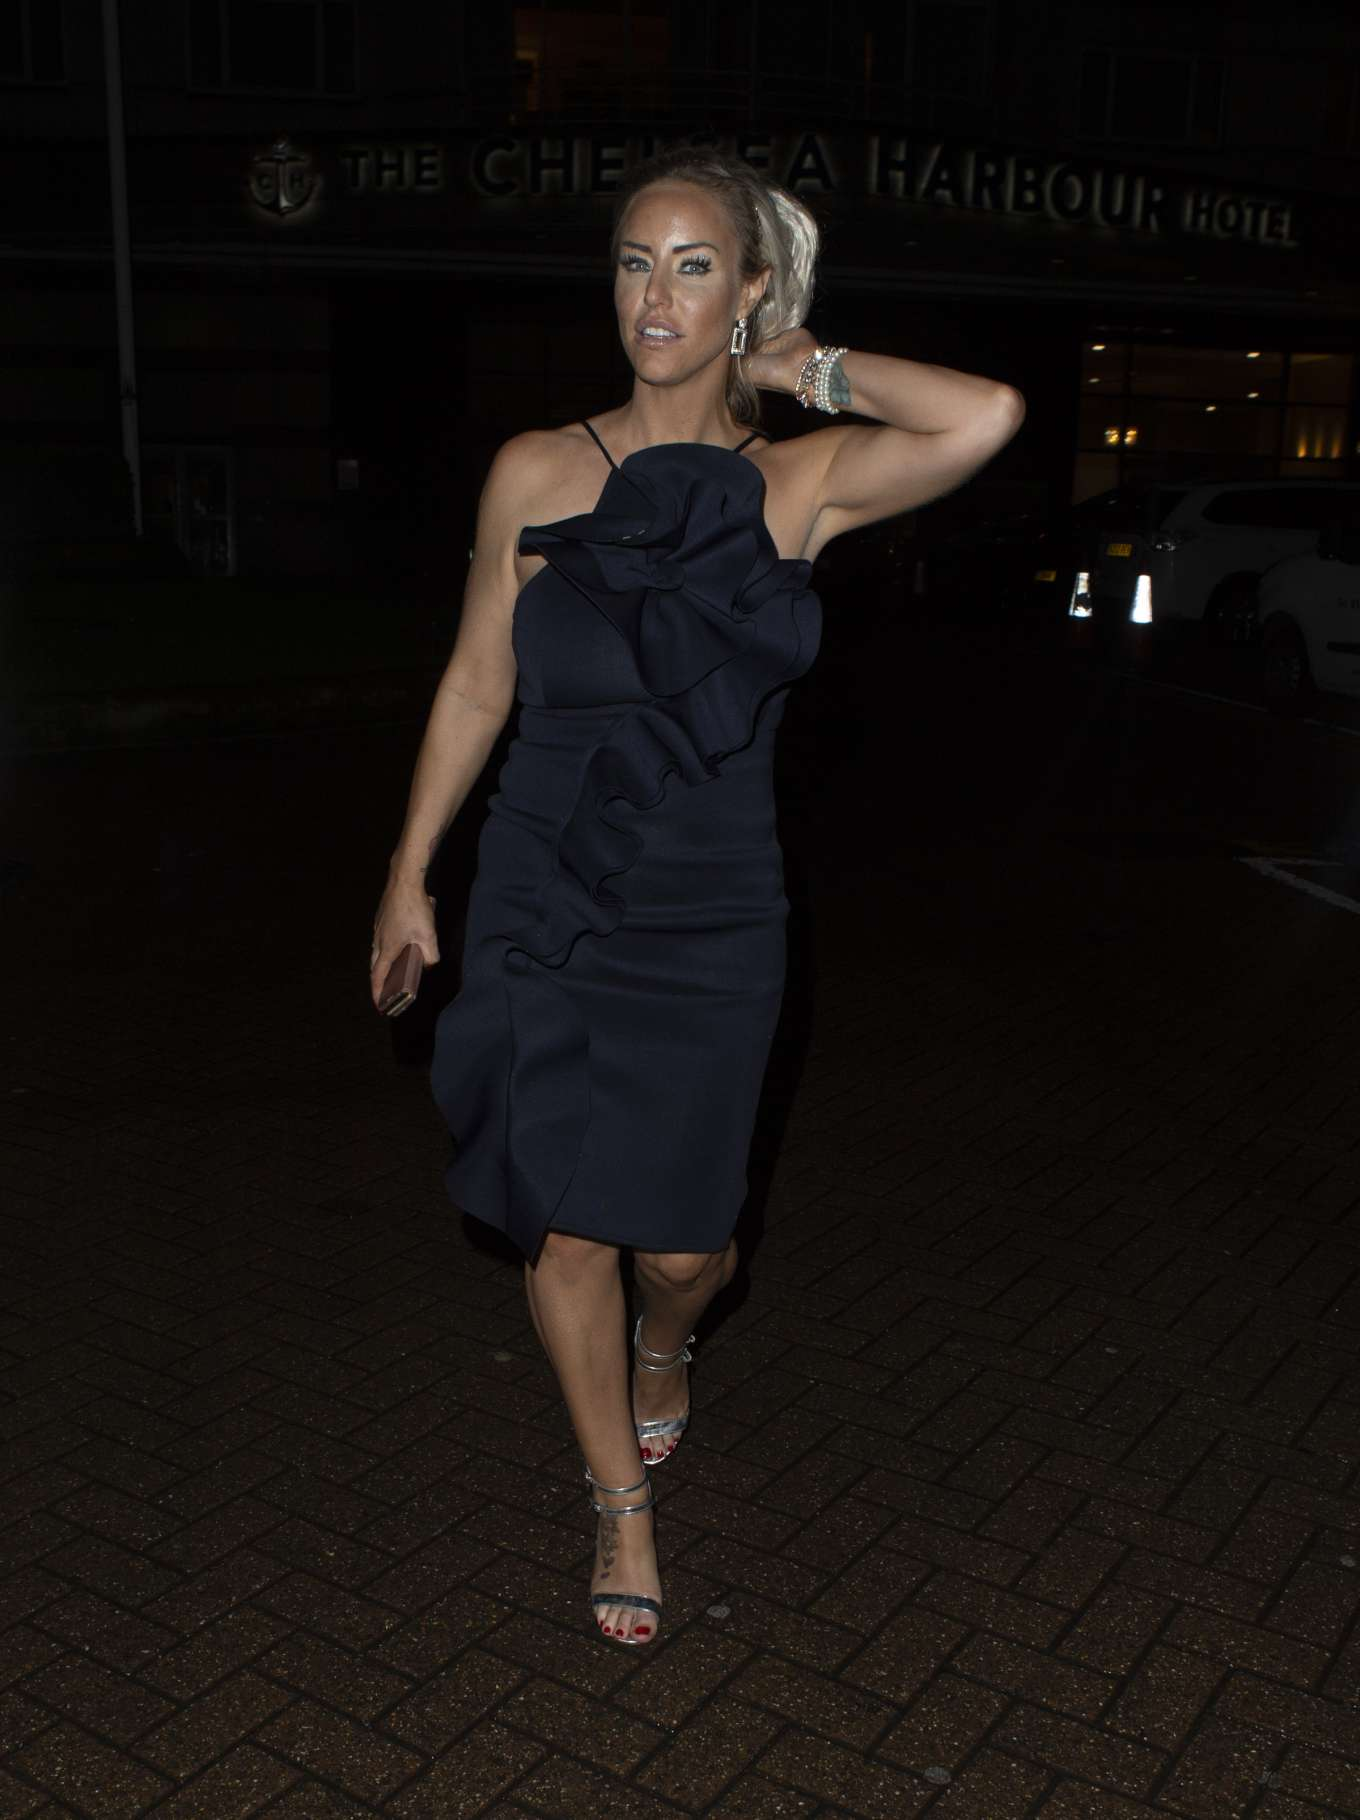 Danielle Mason - Seen at Chelsea Harbor Hotel in London